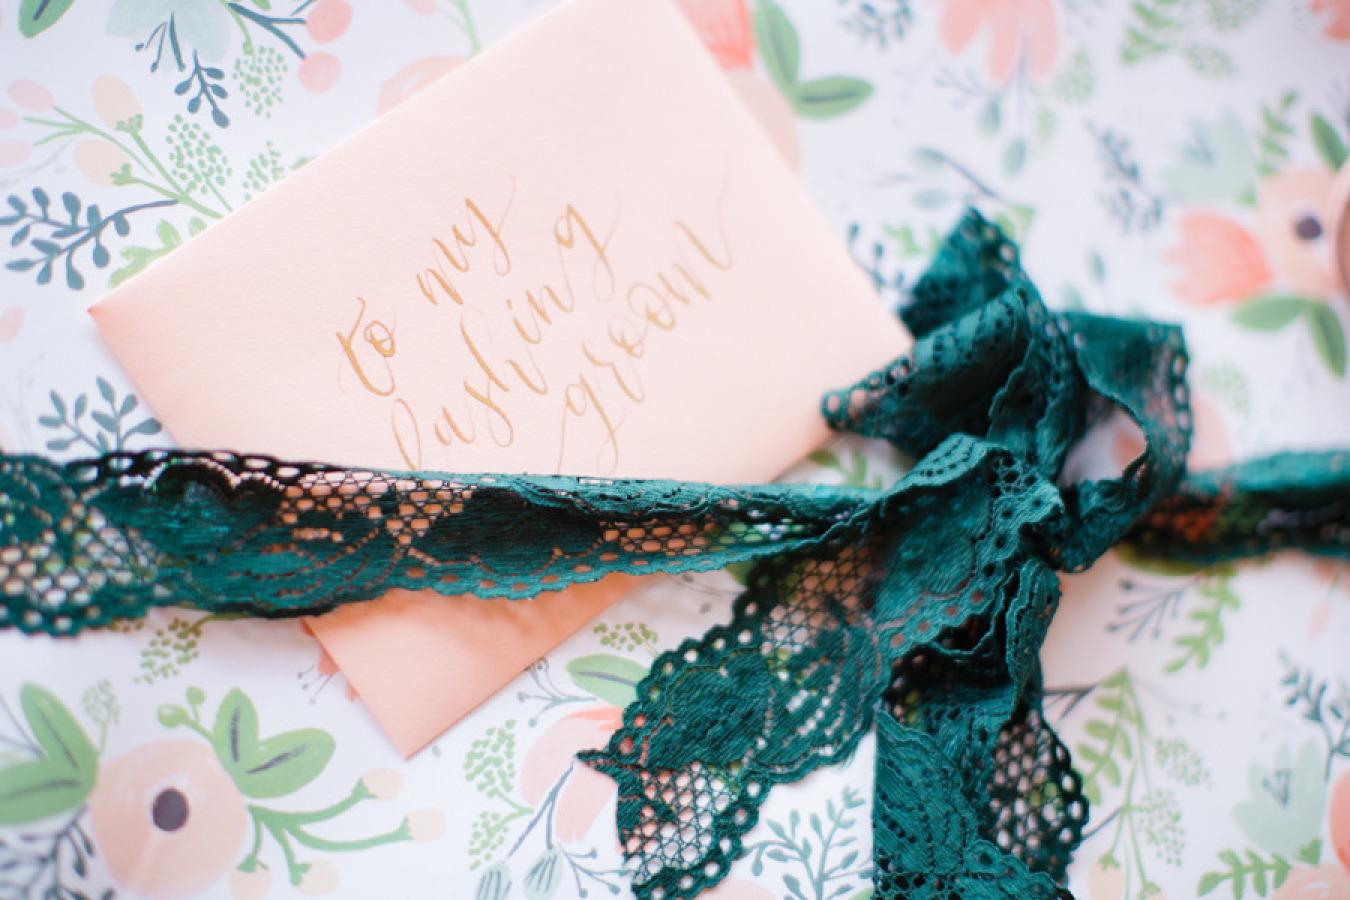 Bride and groom wedding present